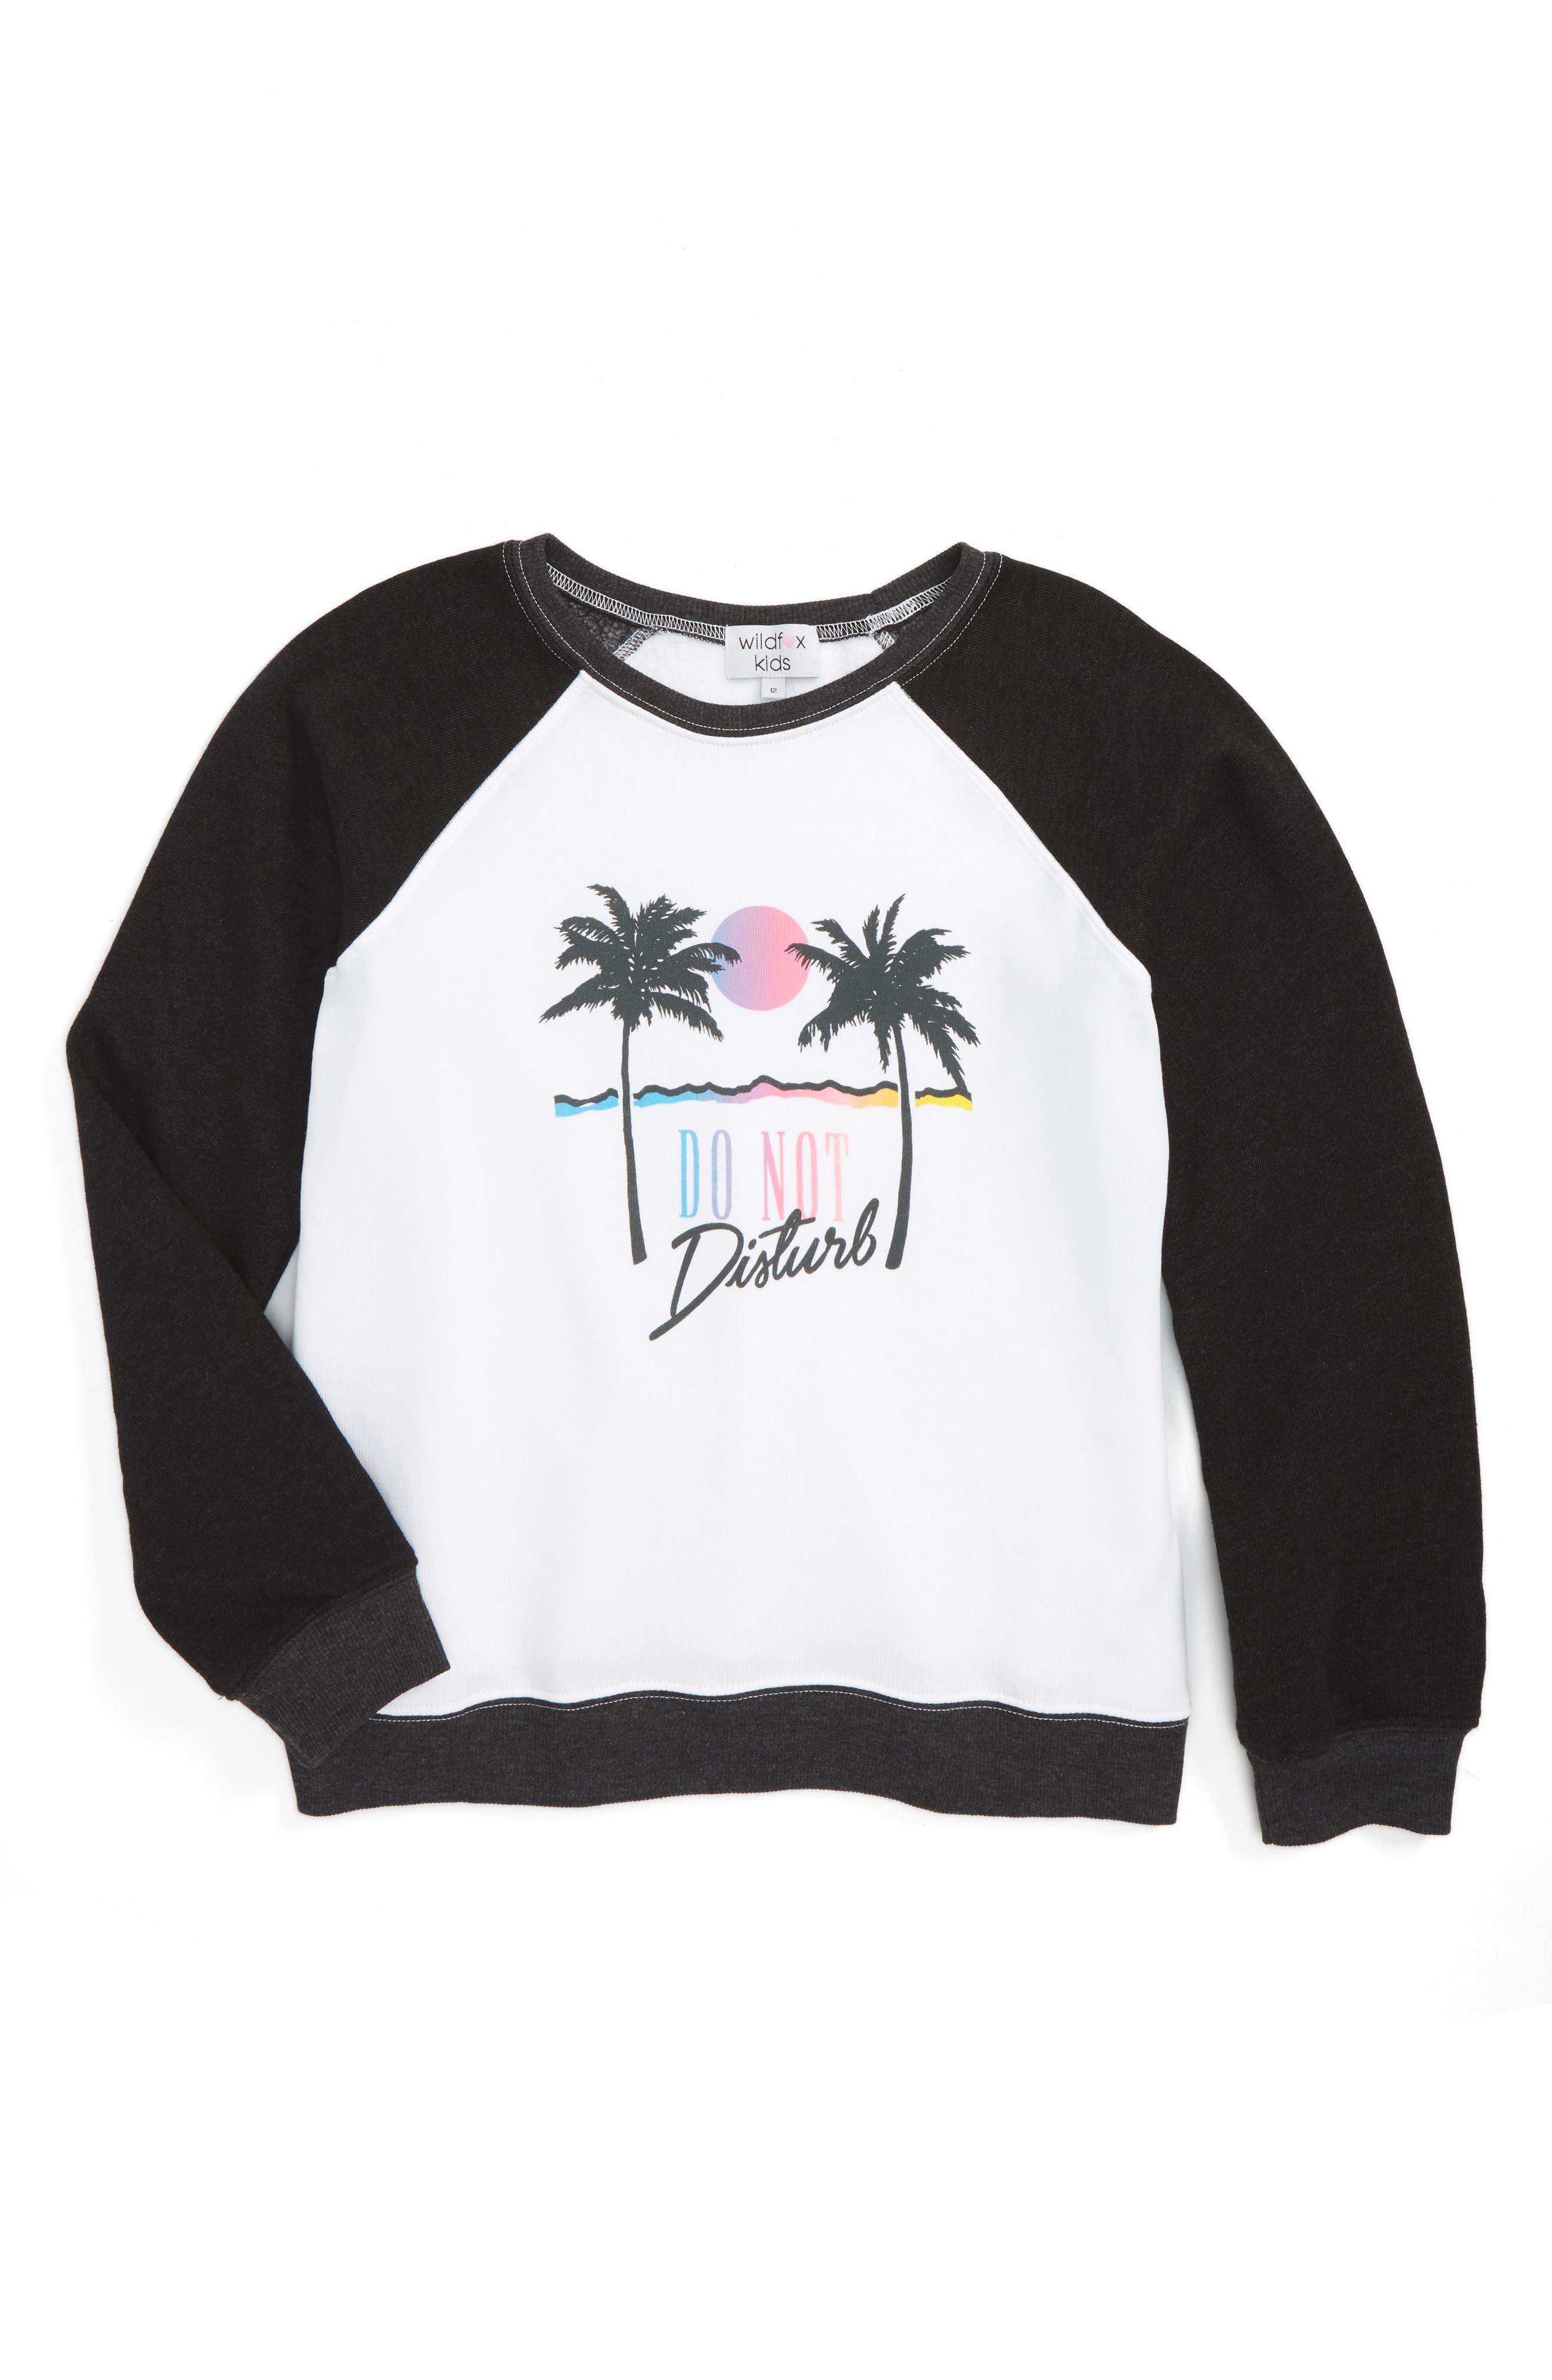 Alternate Image 1 Selected - Wildfox Do Not Disturb Graphic Sweatshirt (Big Girls)